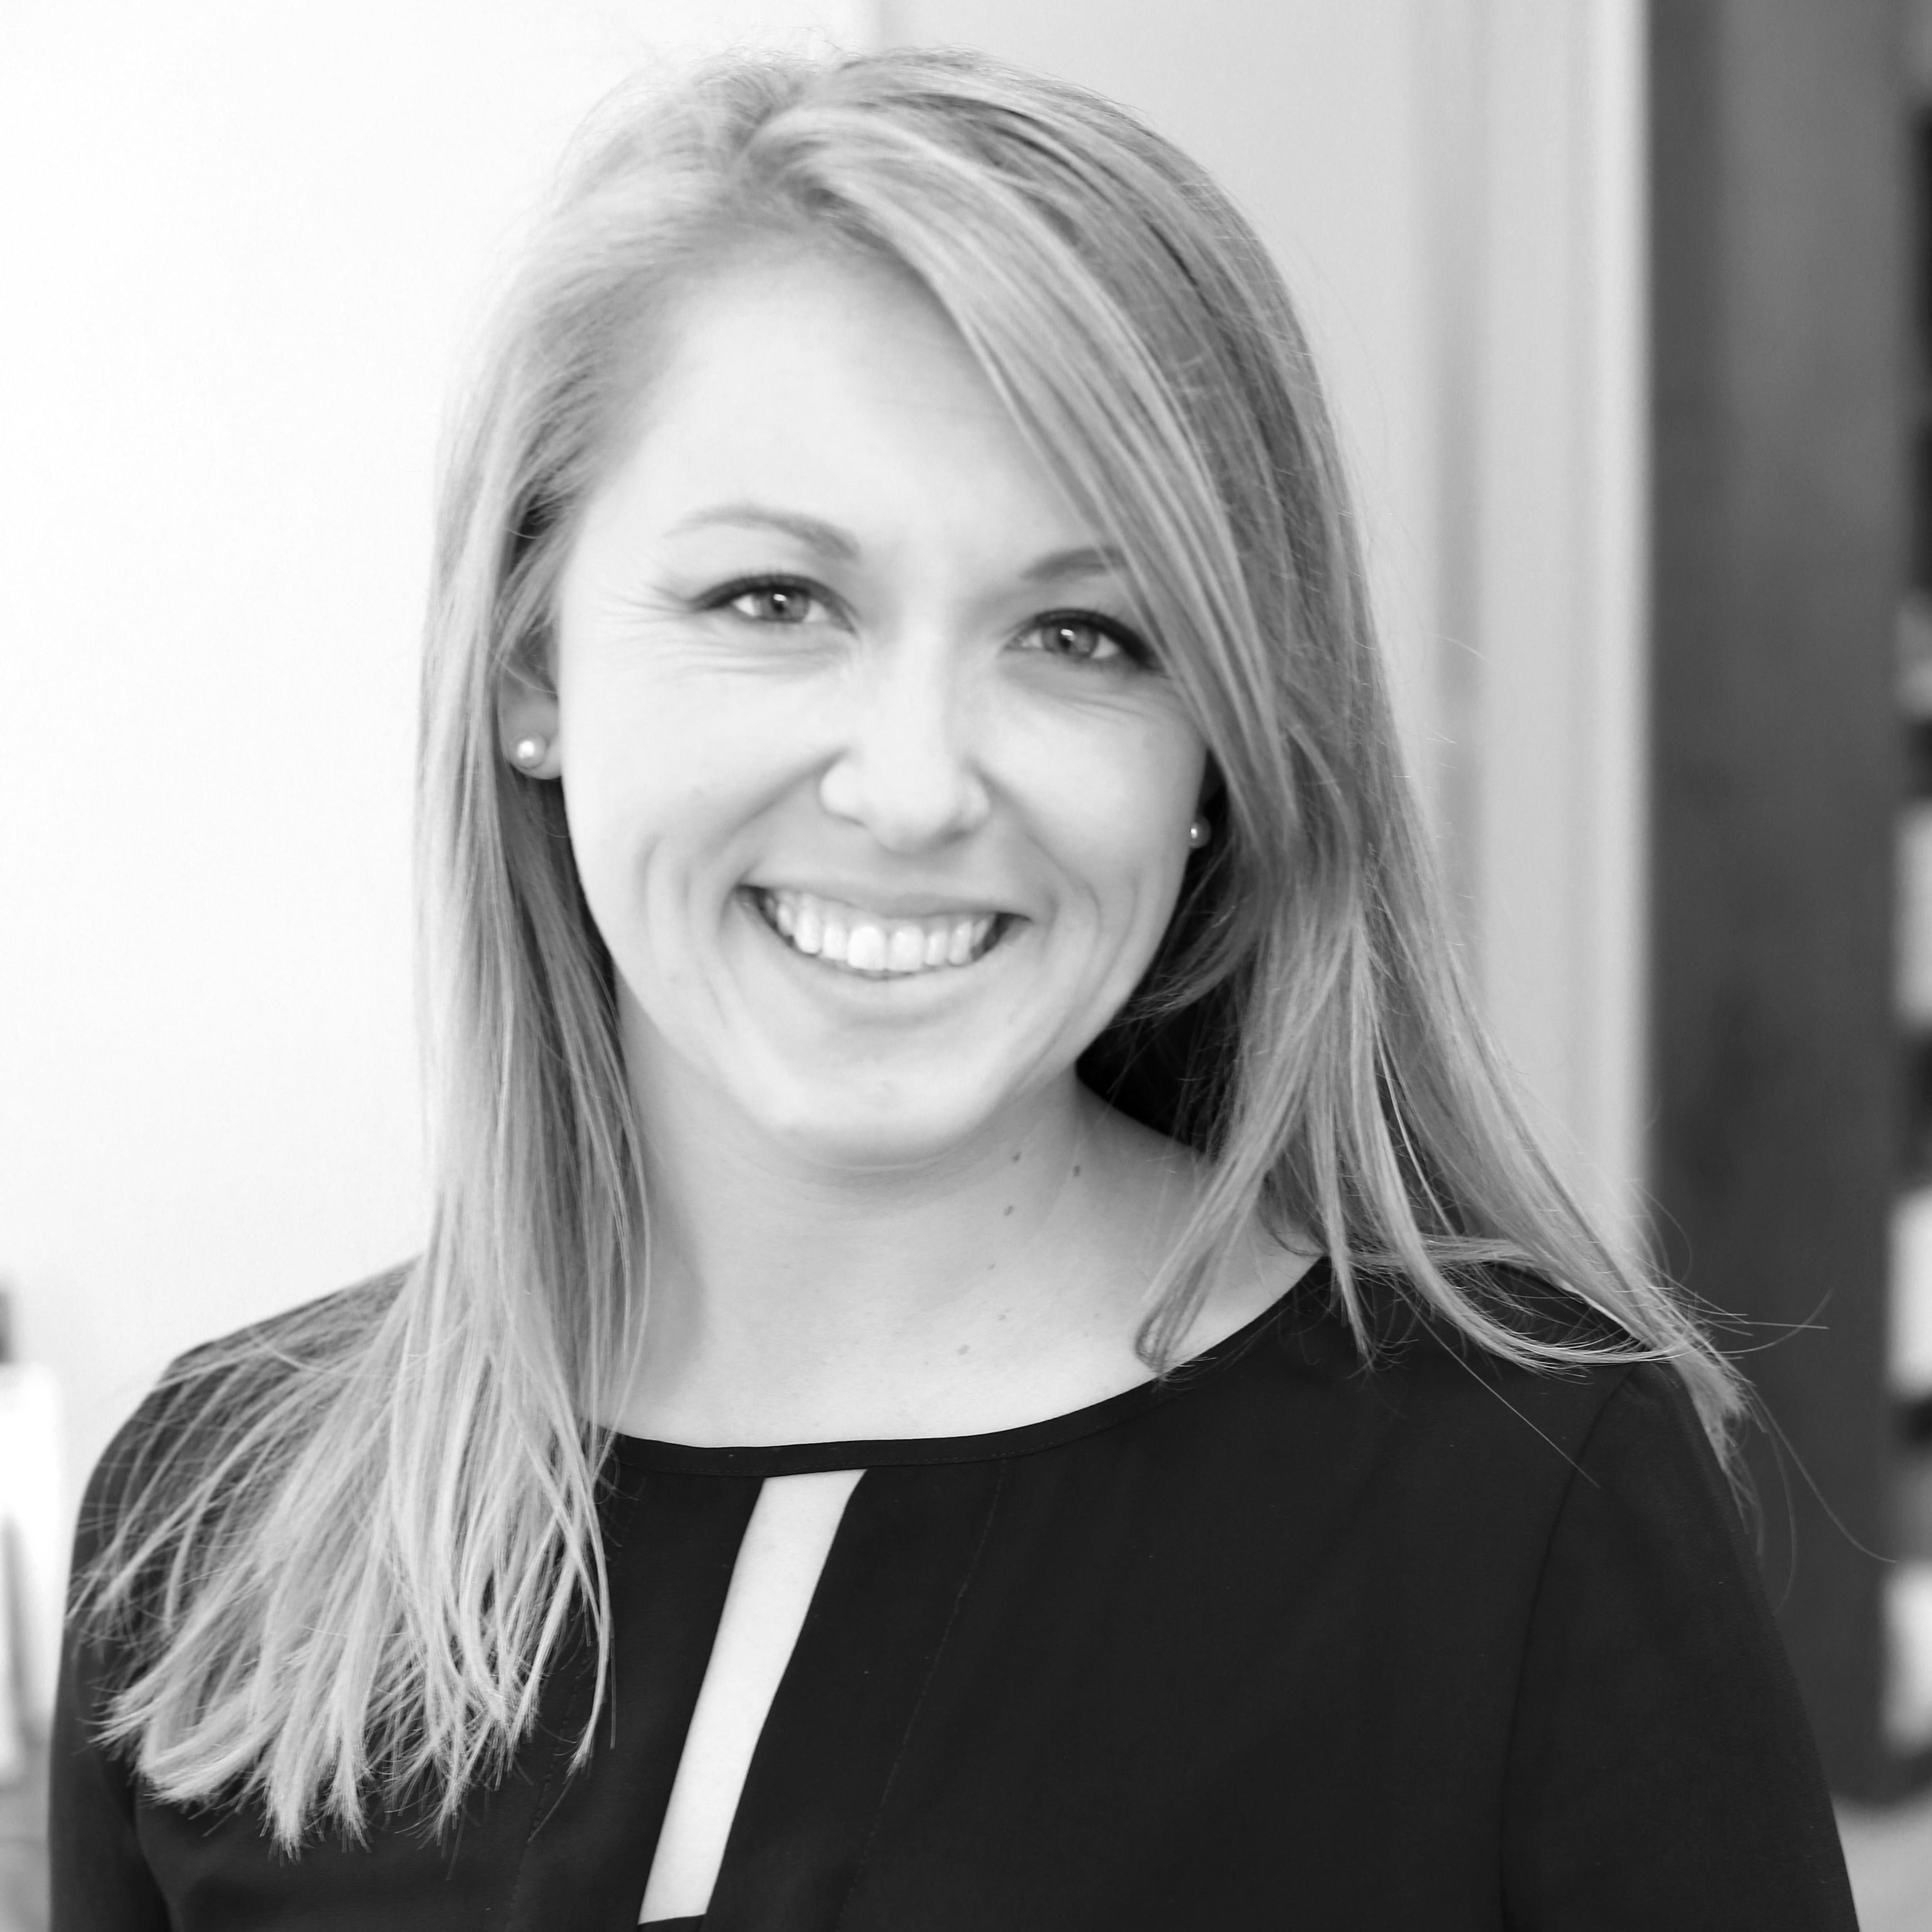 iEARN-USA Change Maker: Christine